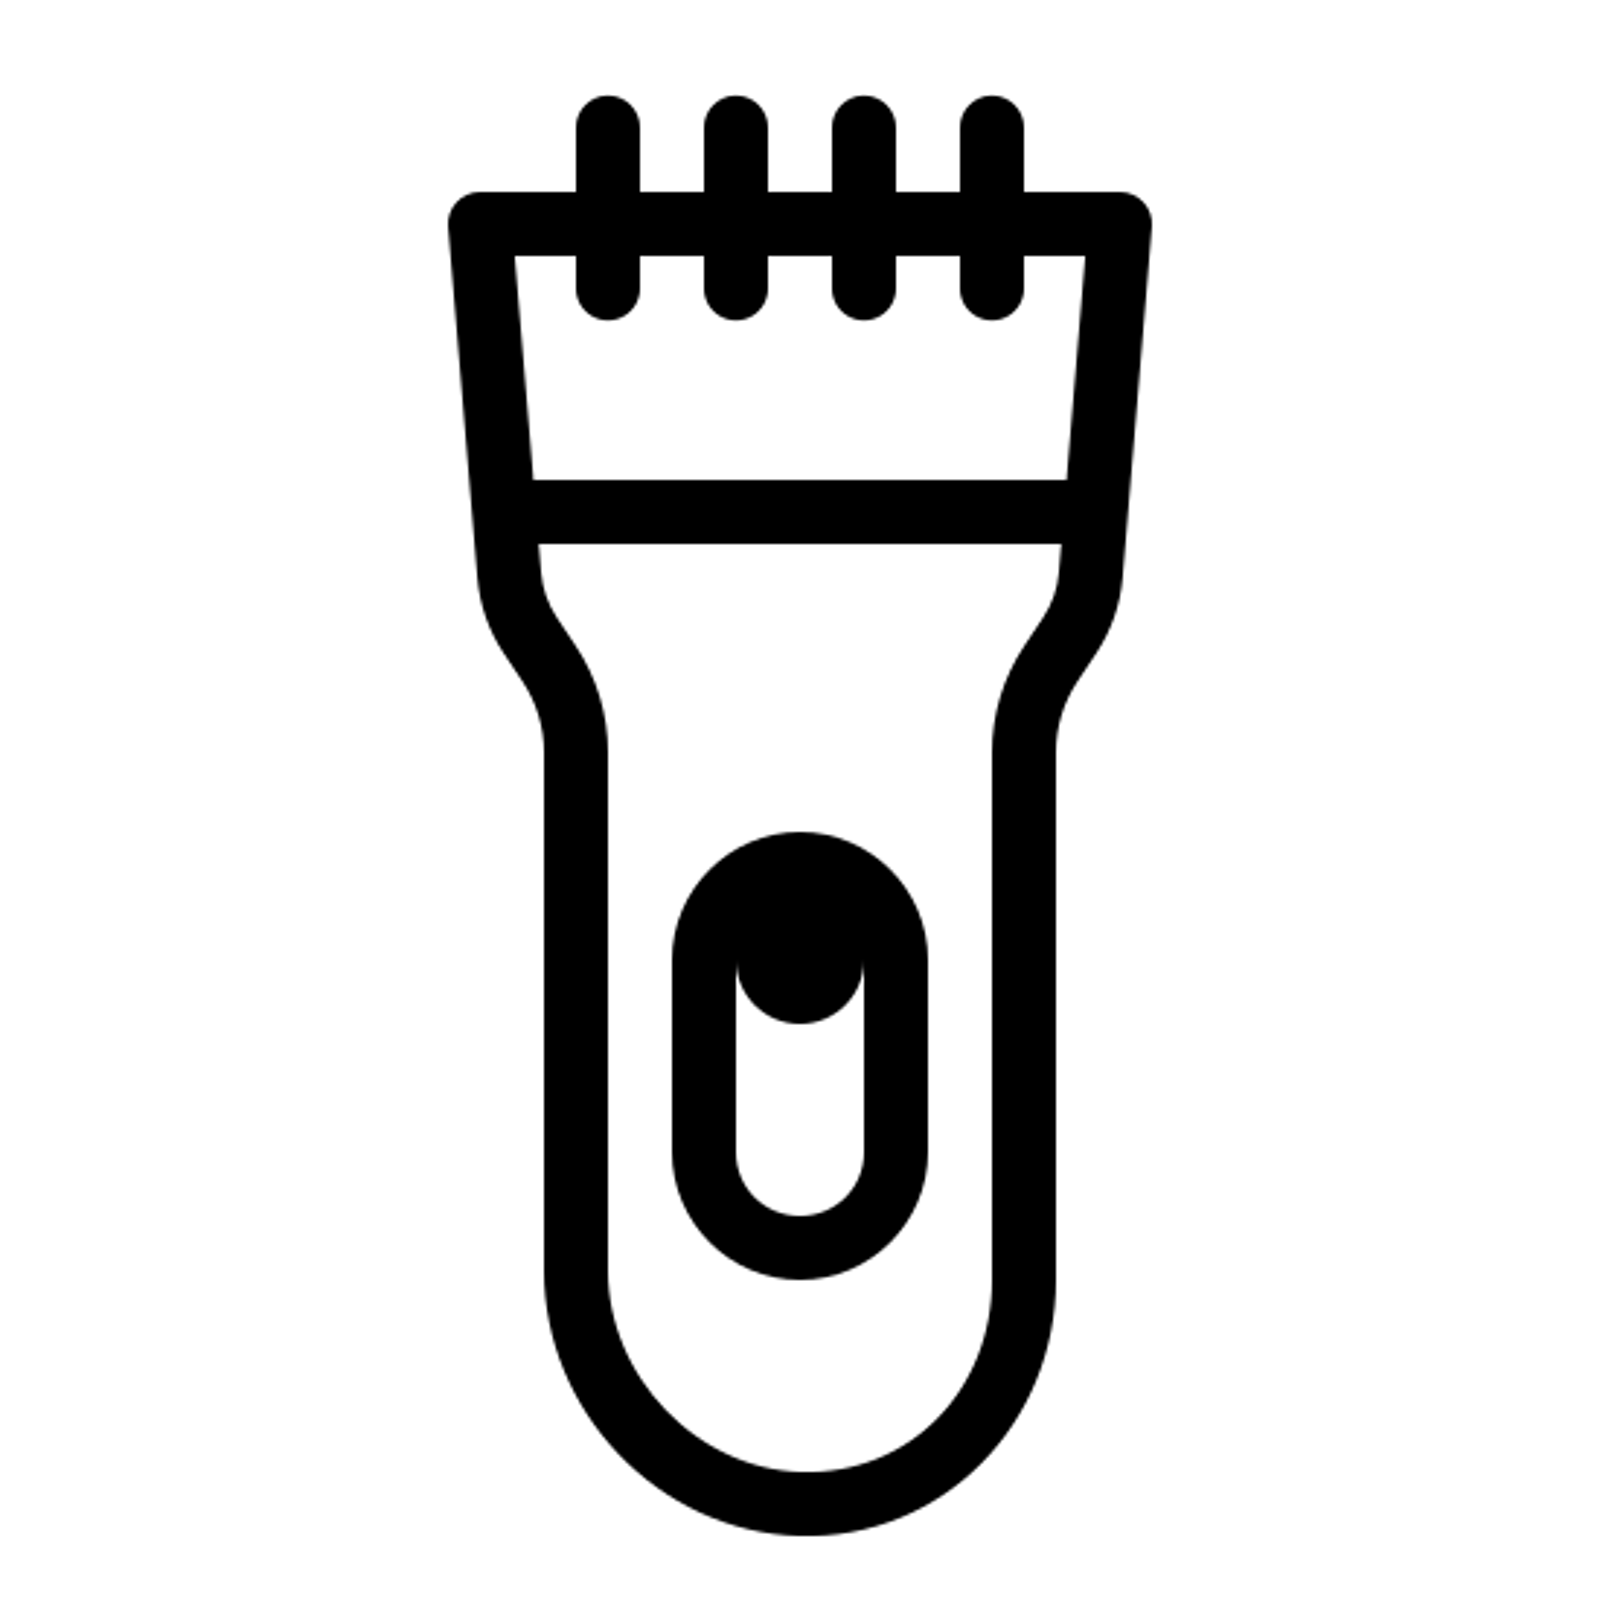 Barbeiros Clippers icon